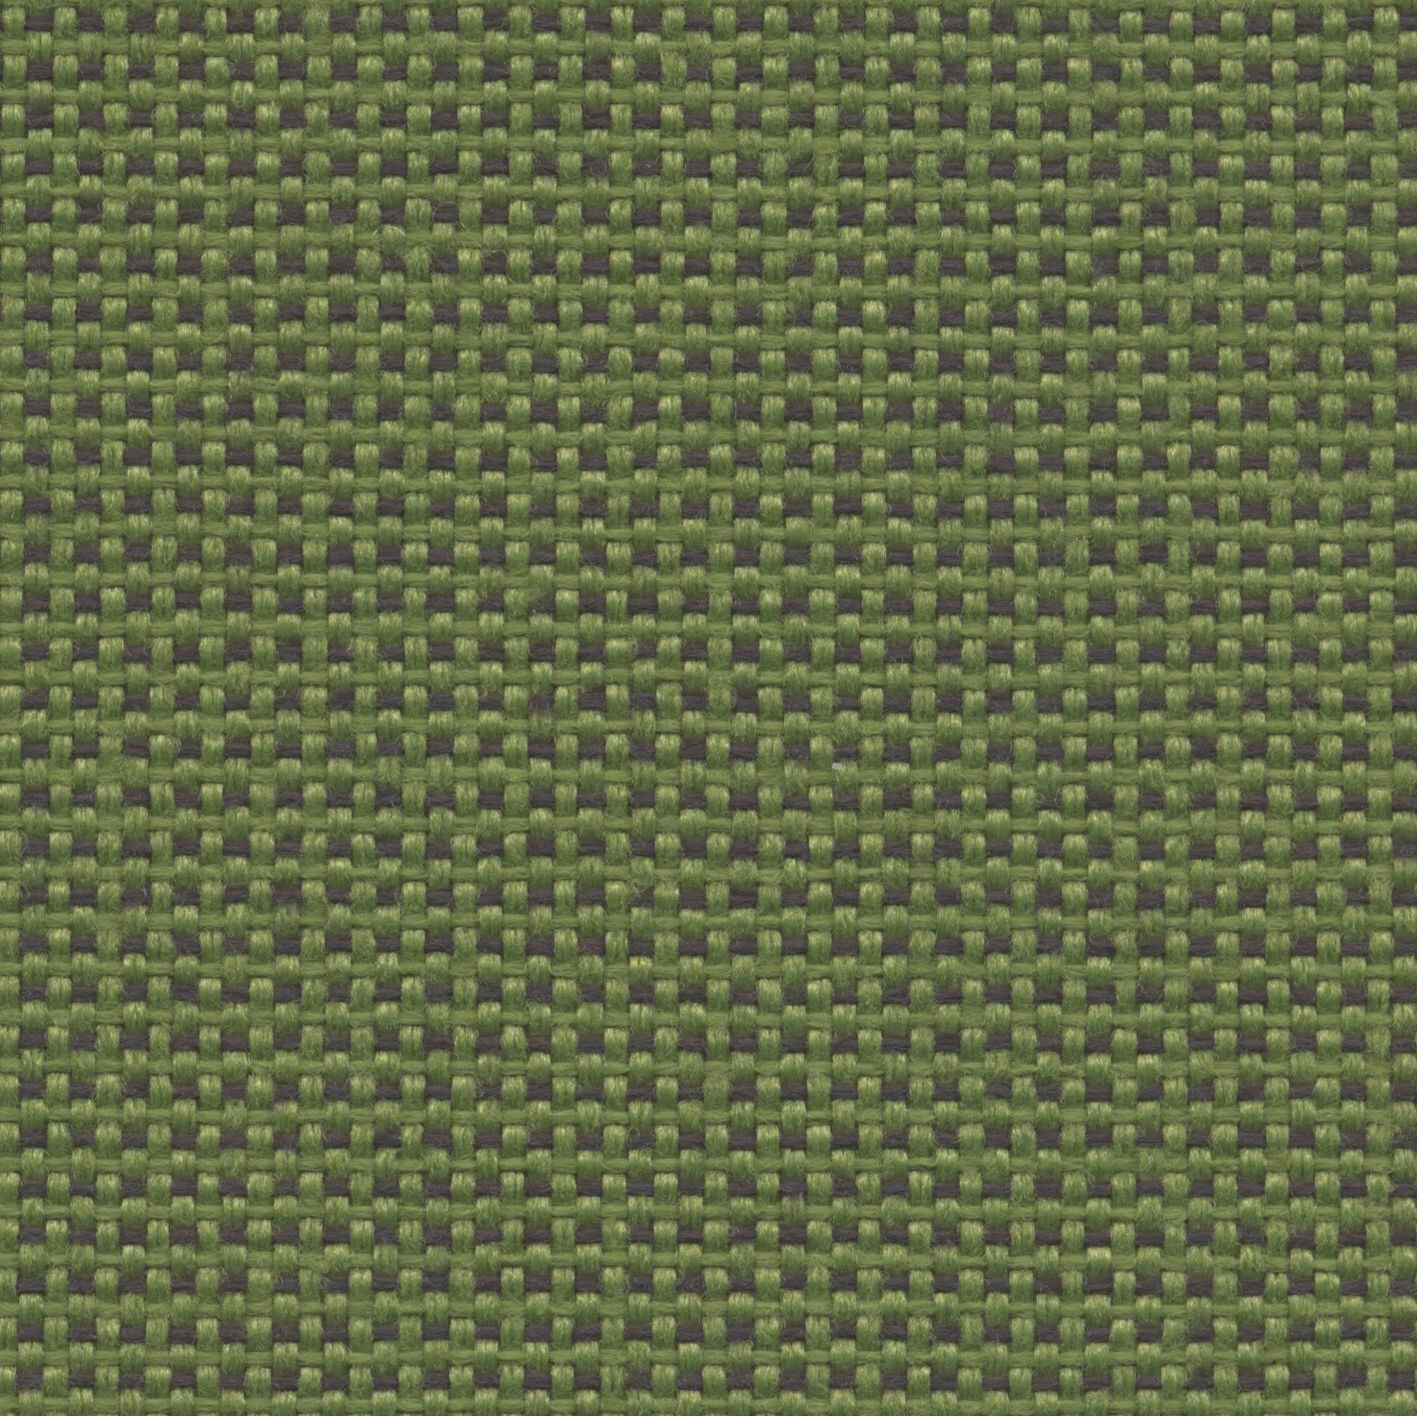 055-9706-7